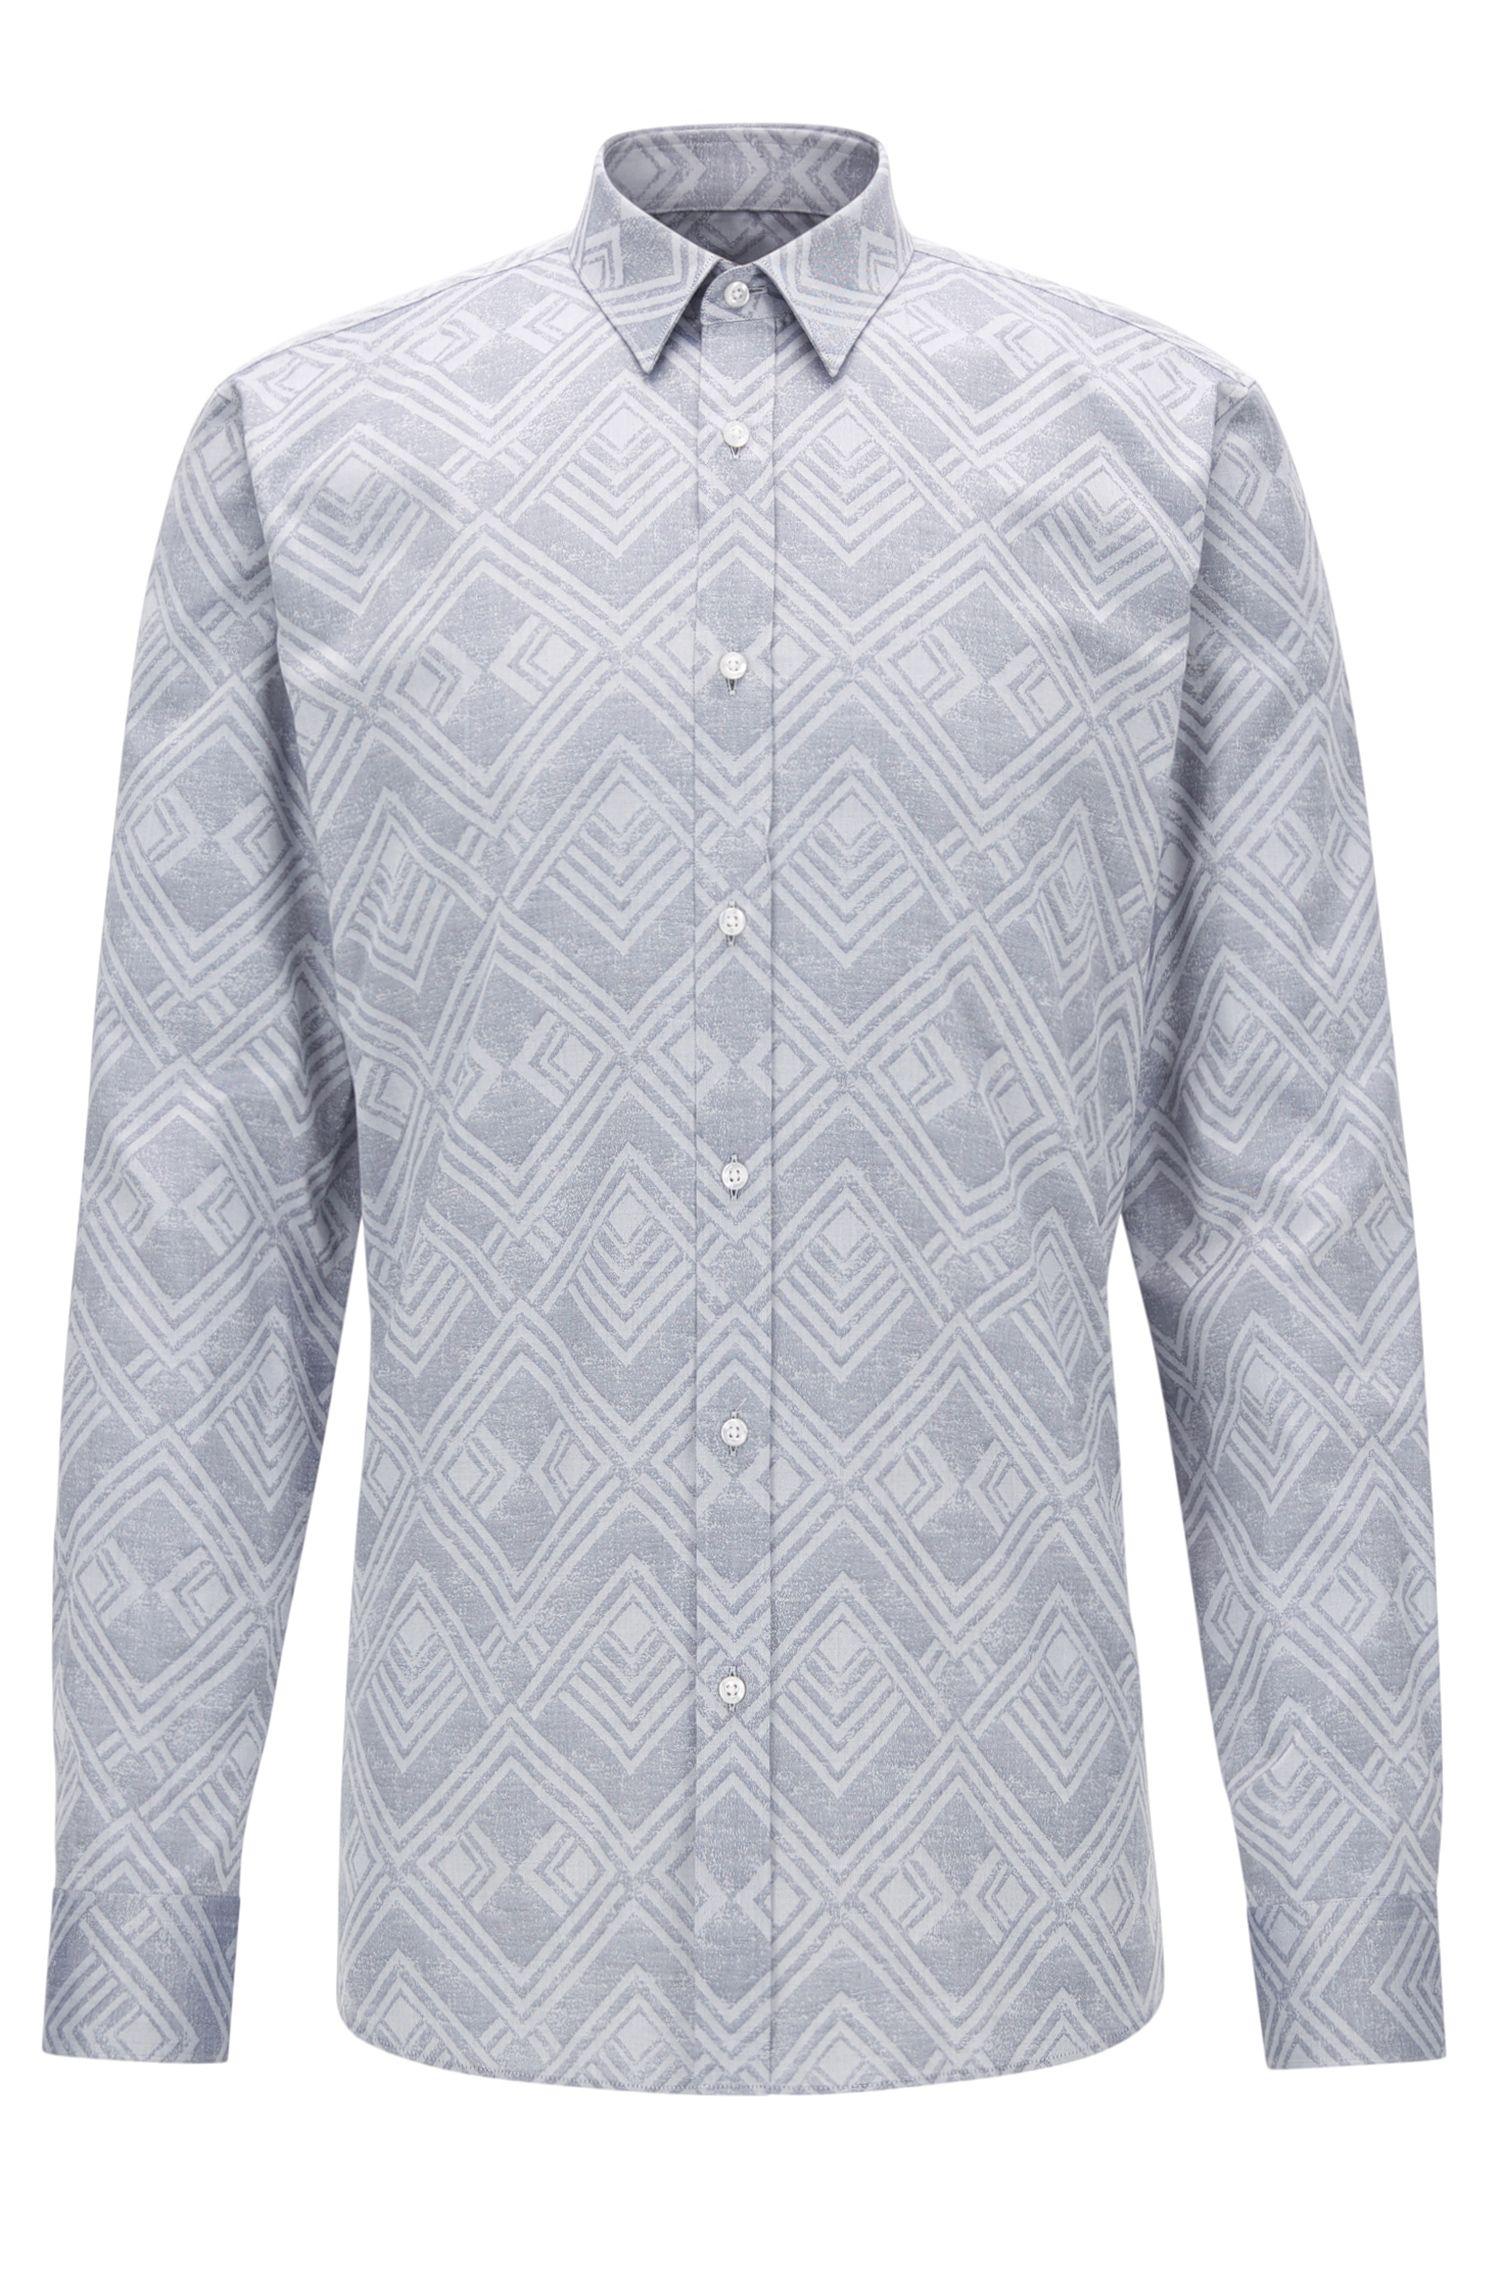 Jacquard Cotton Button Down Shirt, Extra Slim Fit | Elisha